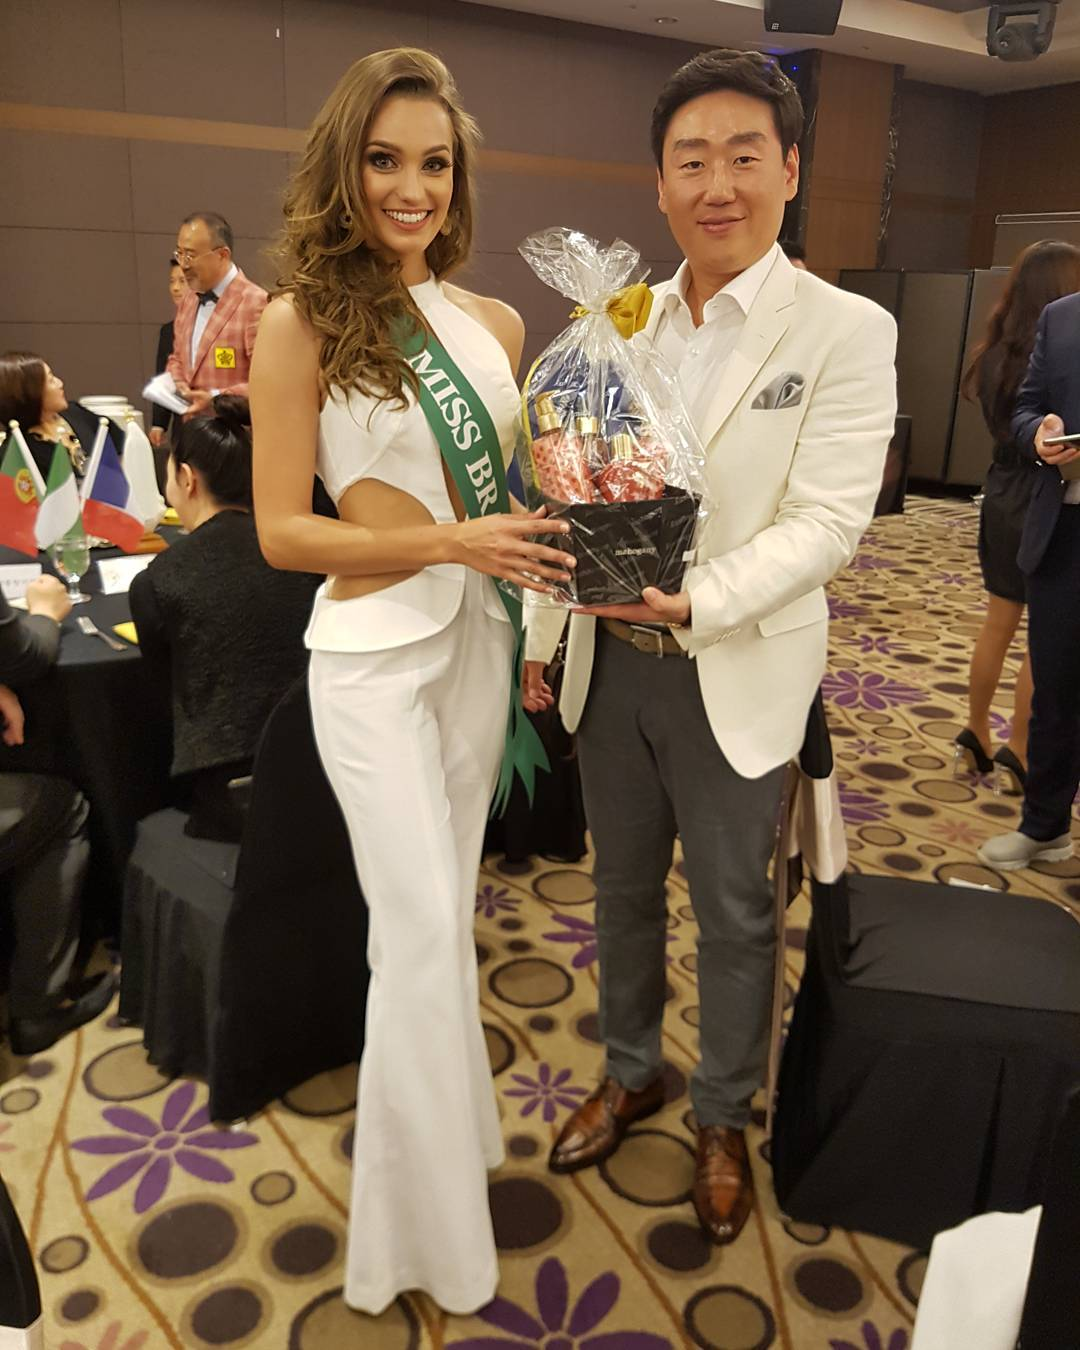 isabele pandini nogueira, miss grand rio de janeiro 2019/vice de reyna hispanoamericana 2018/top 4 de miss global beauty queen 2016. - Página 2 Xmgc7eug